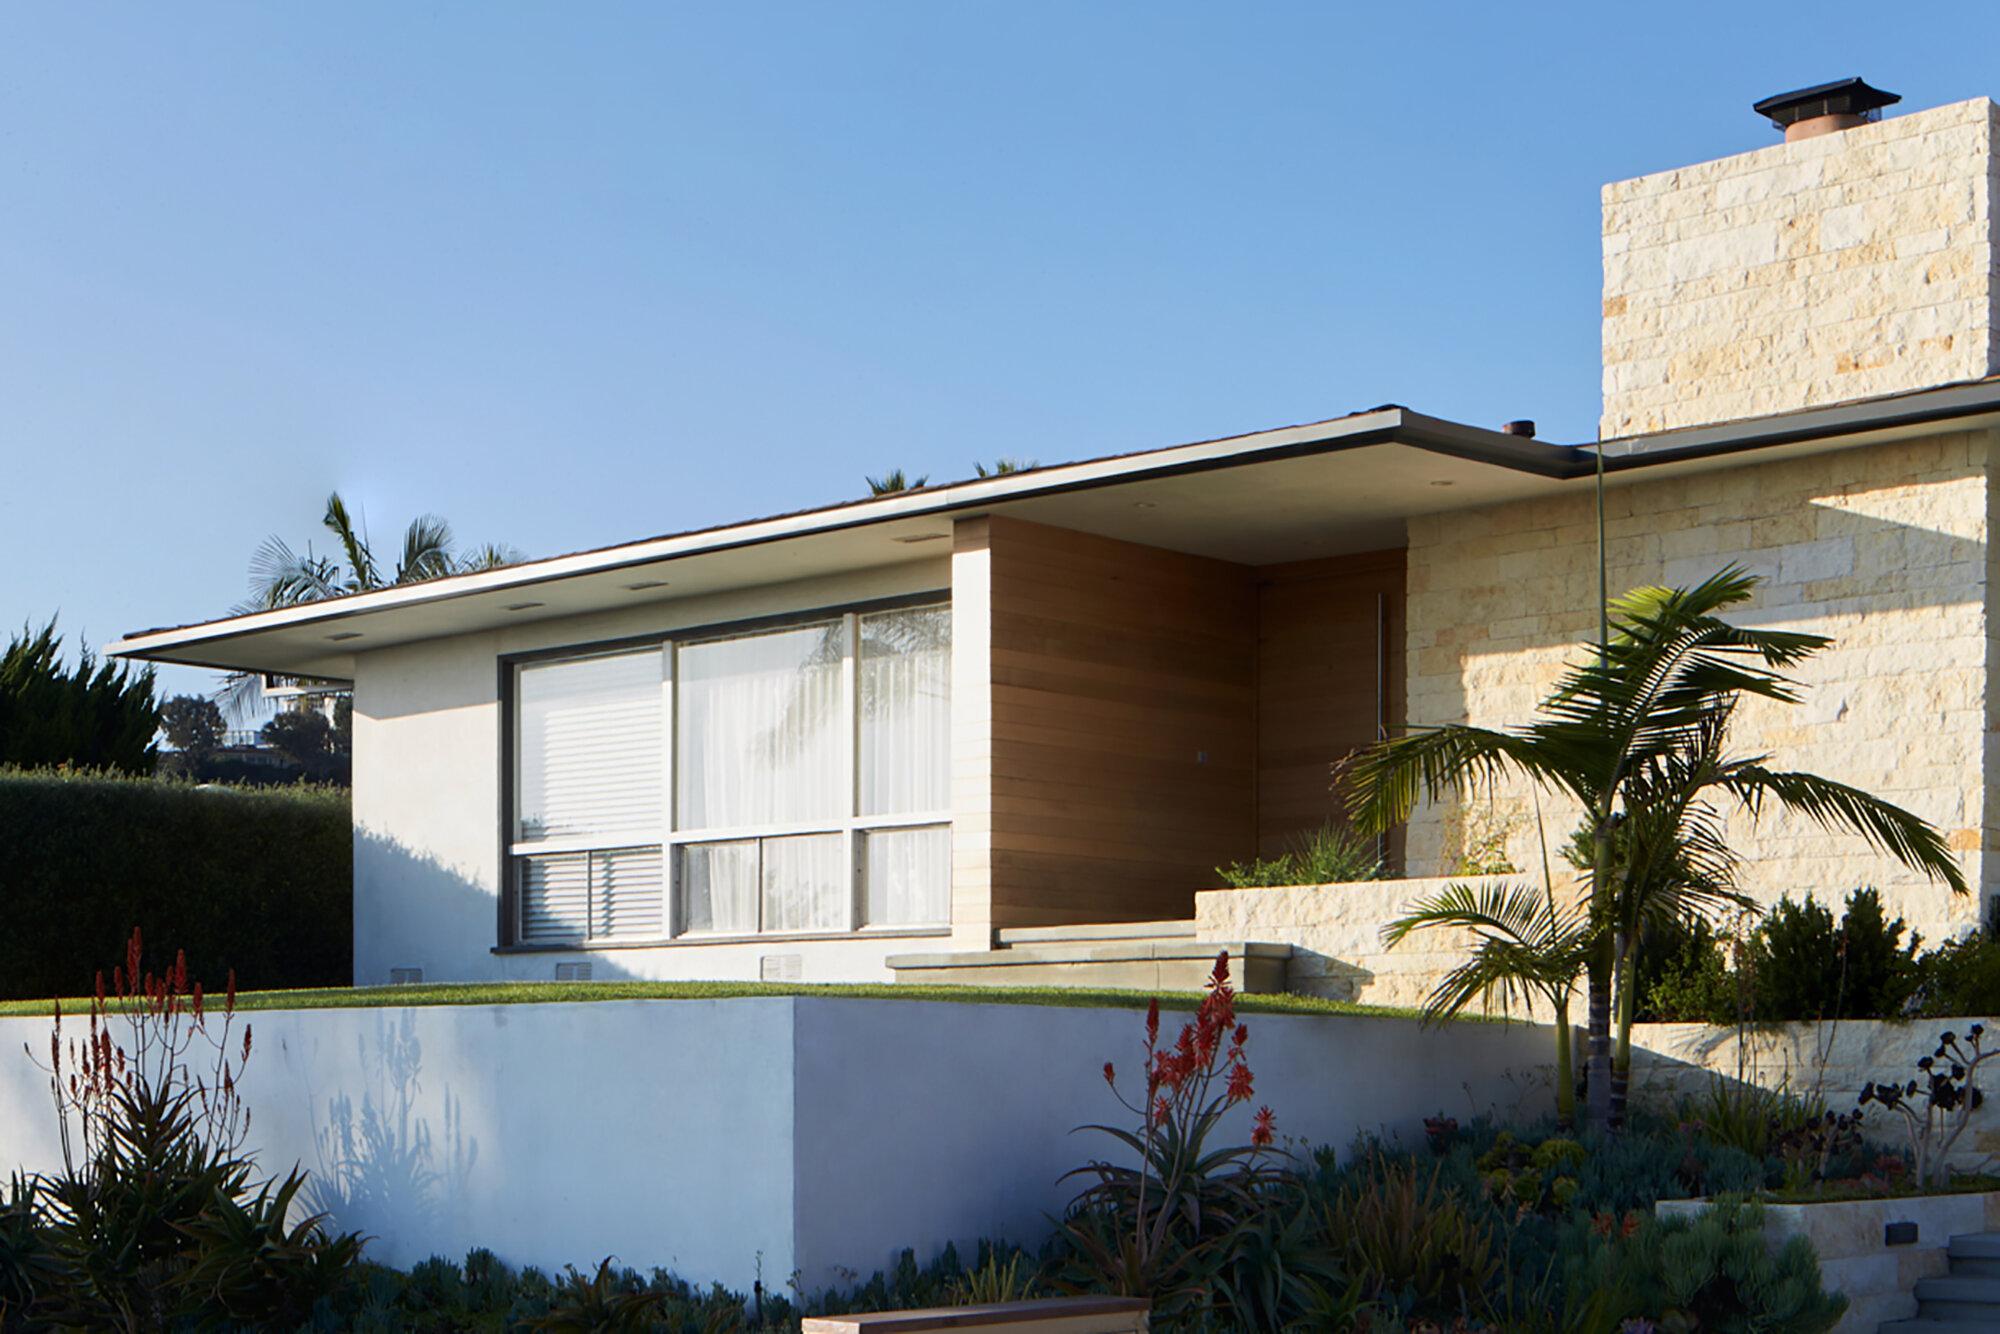 Modern Architecture Los Angeles eyoh